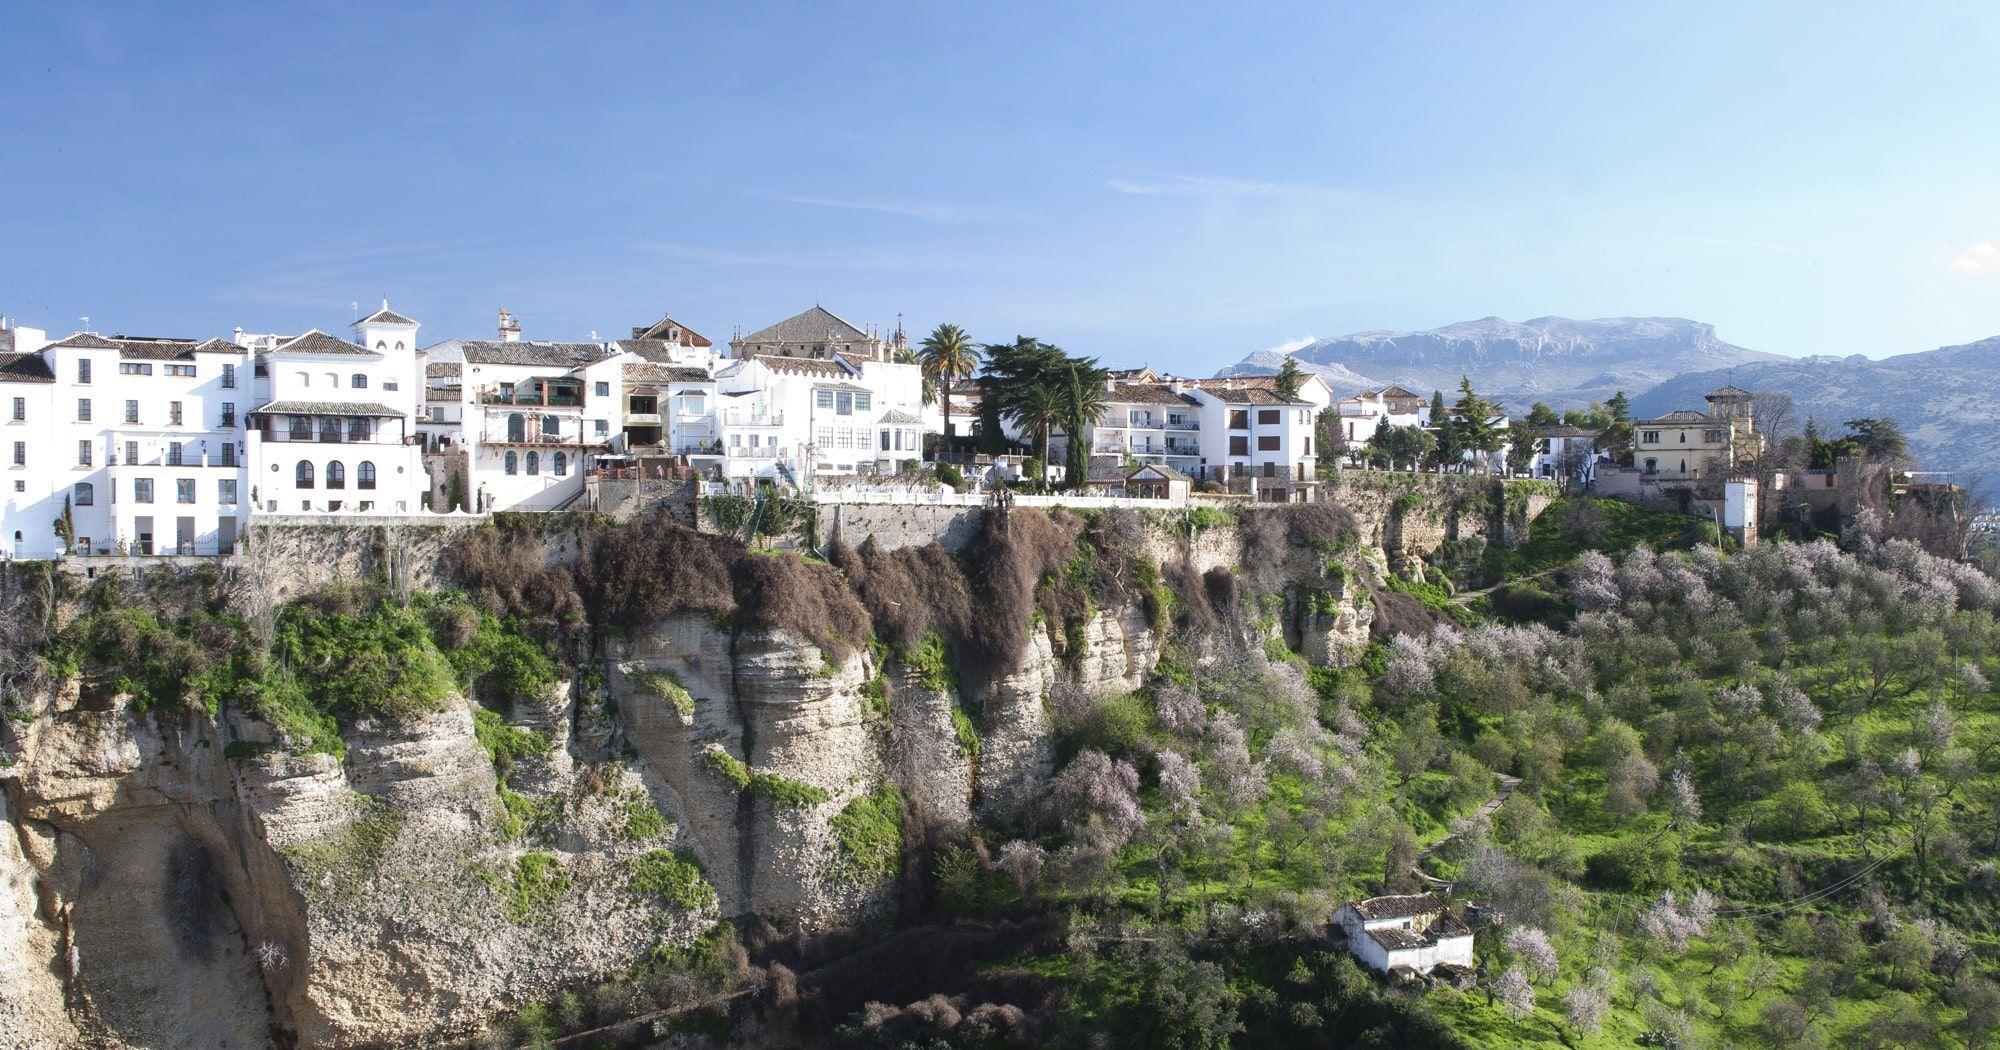 /storage/images/villas-andalucia-spain-200-30-min.jpg